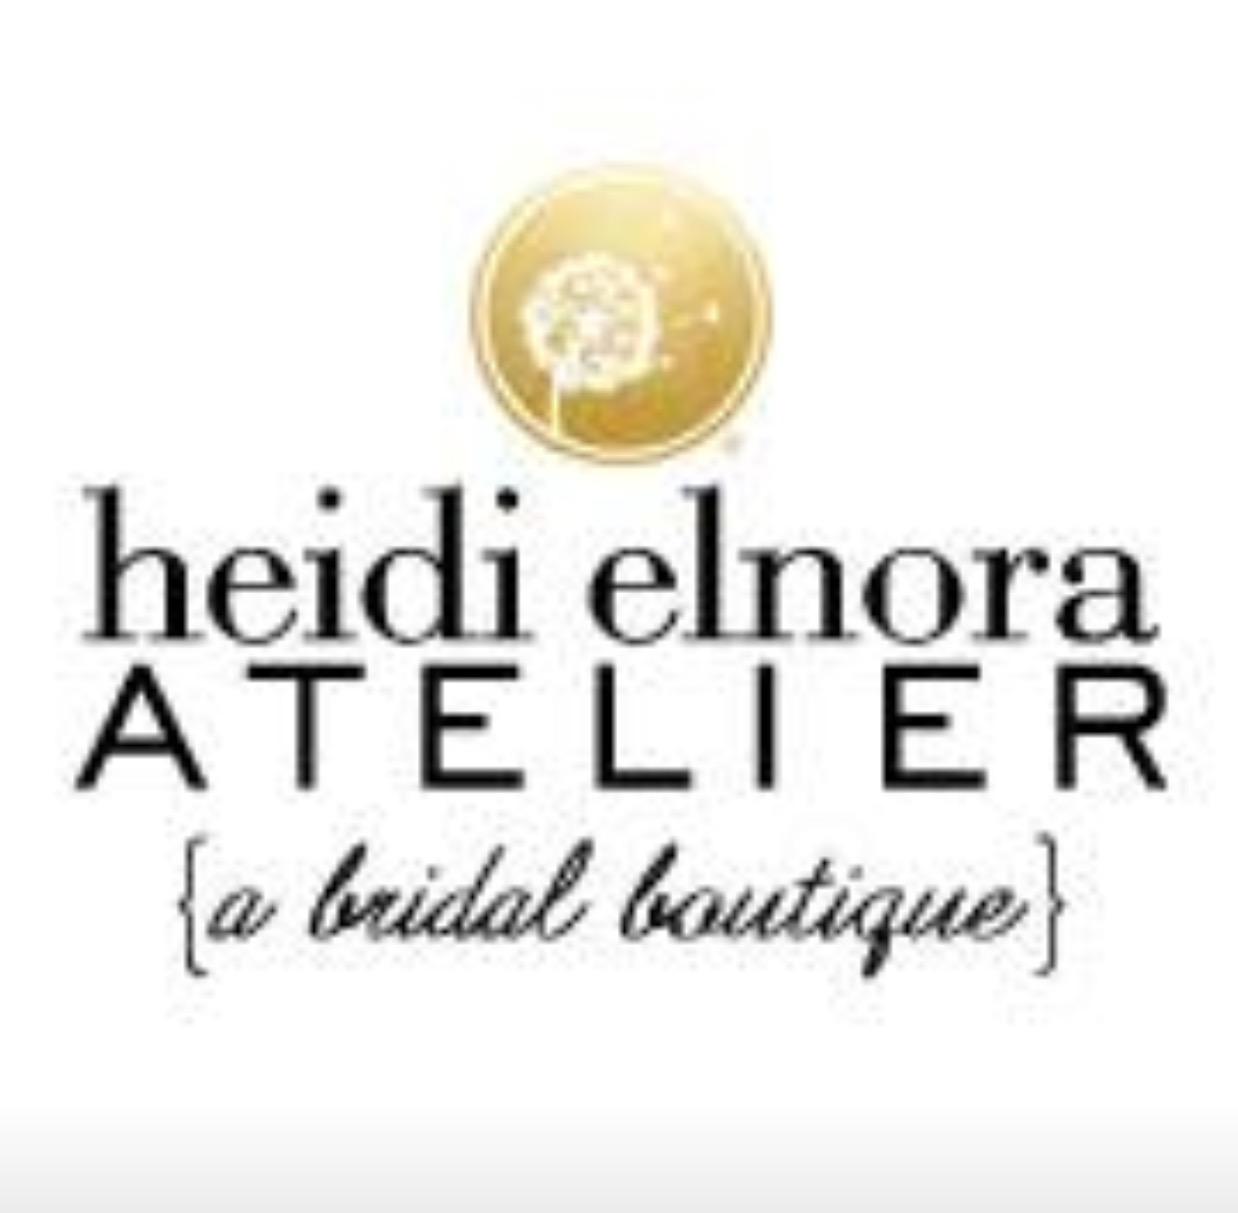 heidi elnora Atelier {a bridal boutique}